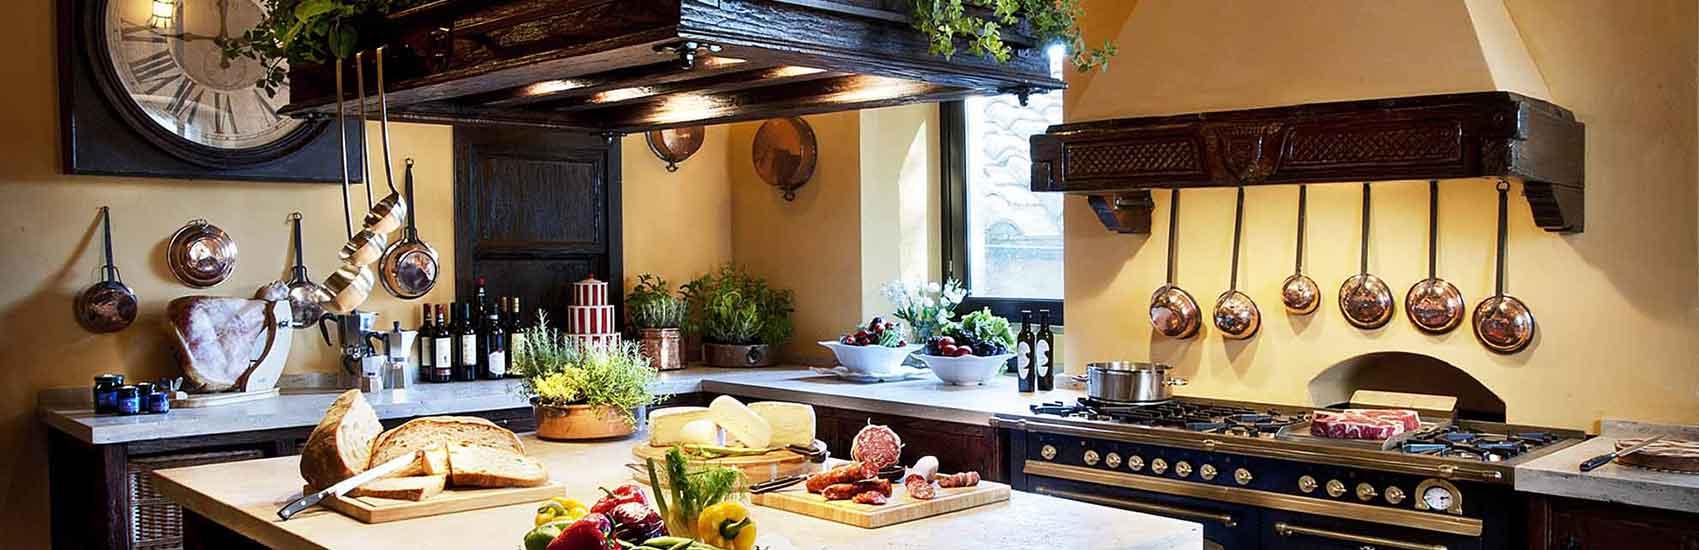 Montalcino Culinary Week 2